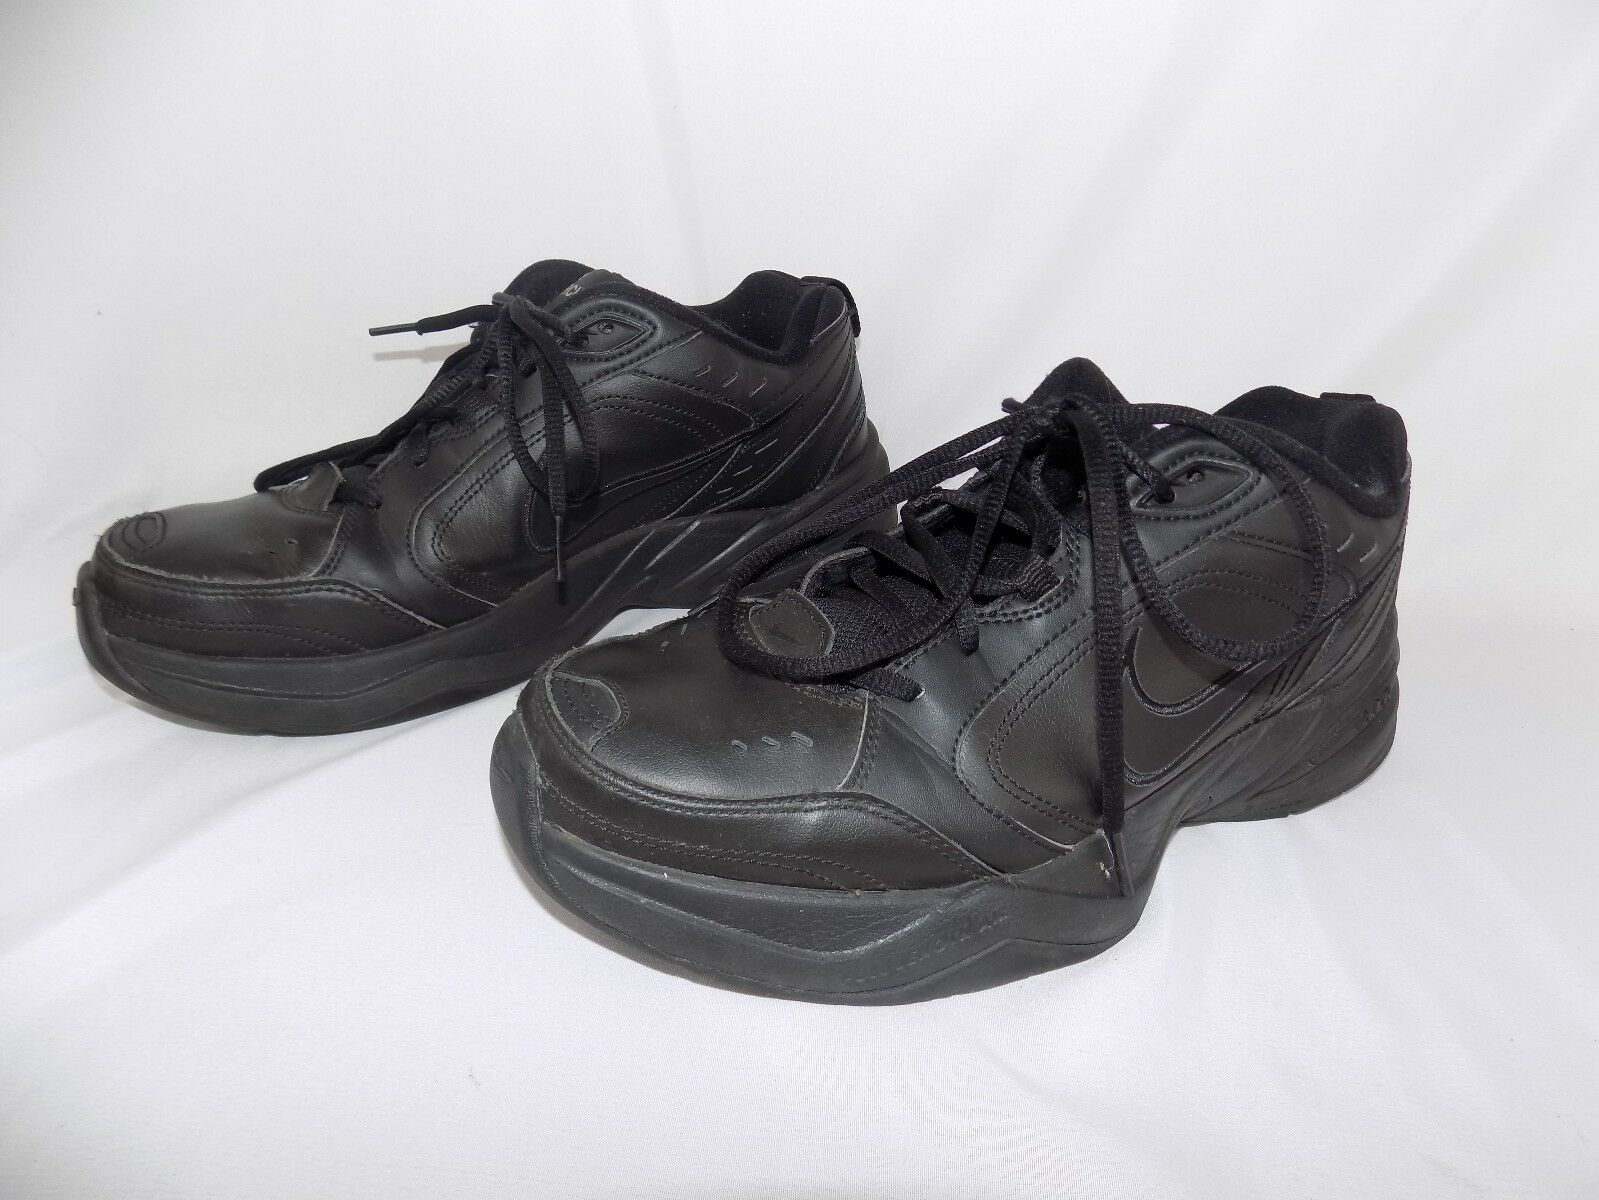 2018 Nike Air zapatos Monarch IV negro zapatos Air atléticos hombres casual zapatos comodos salvaje fe33d1